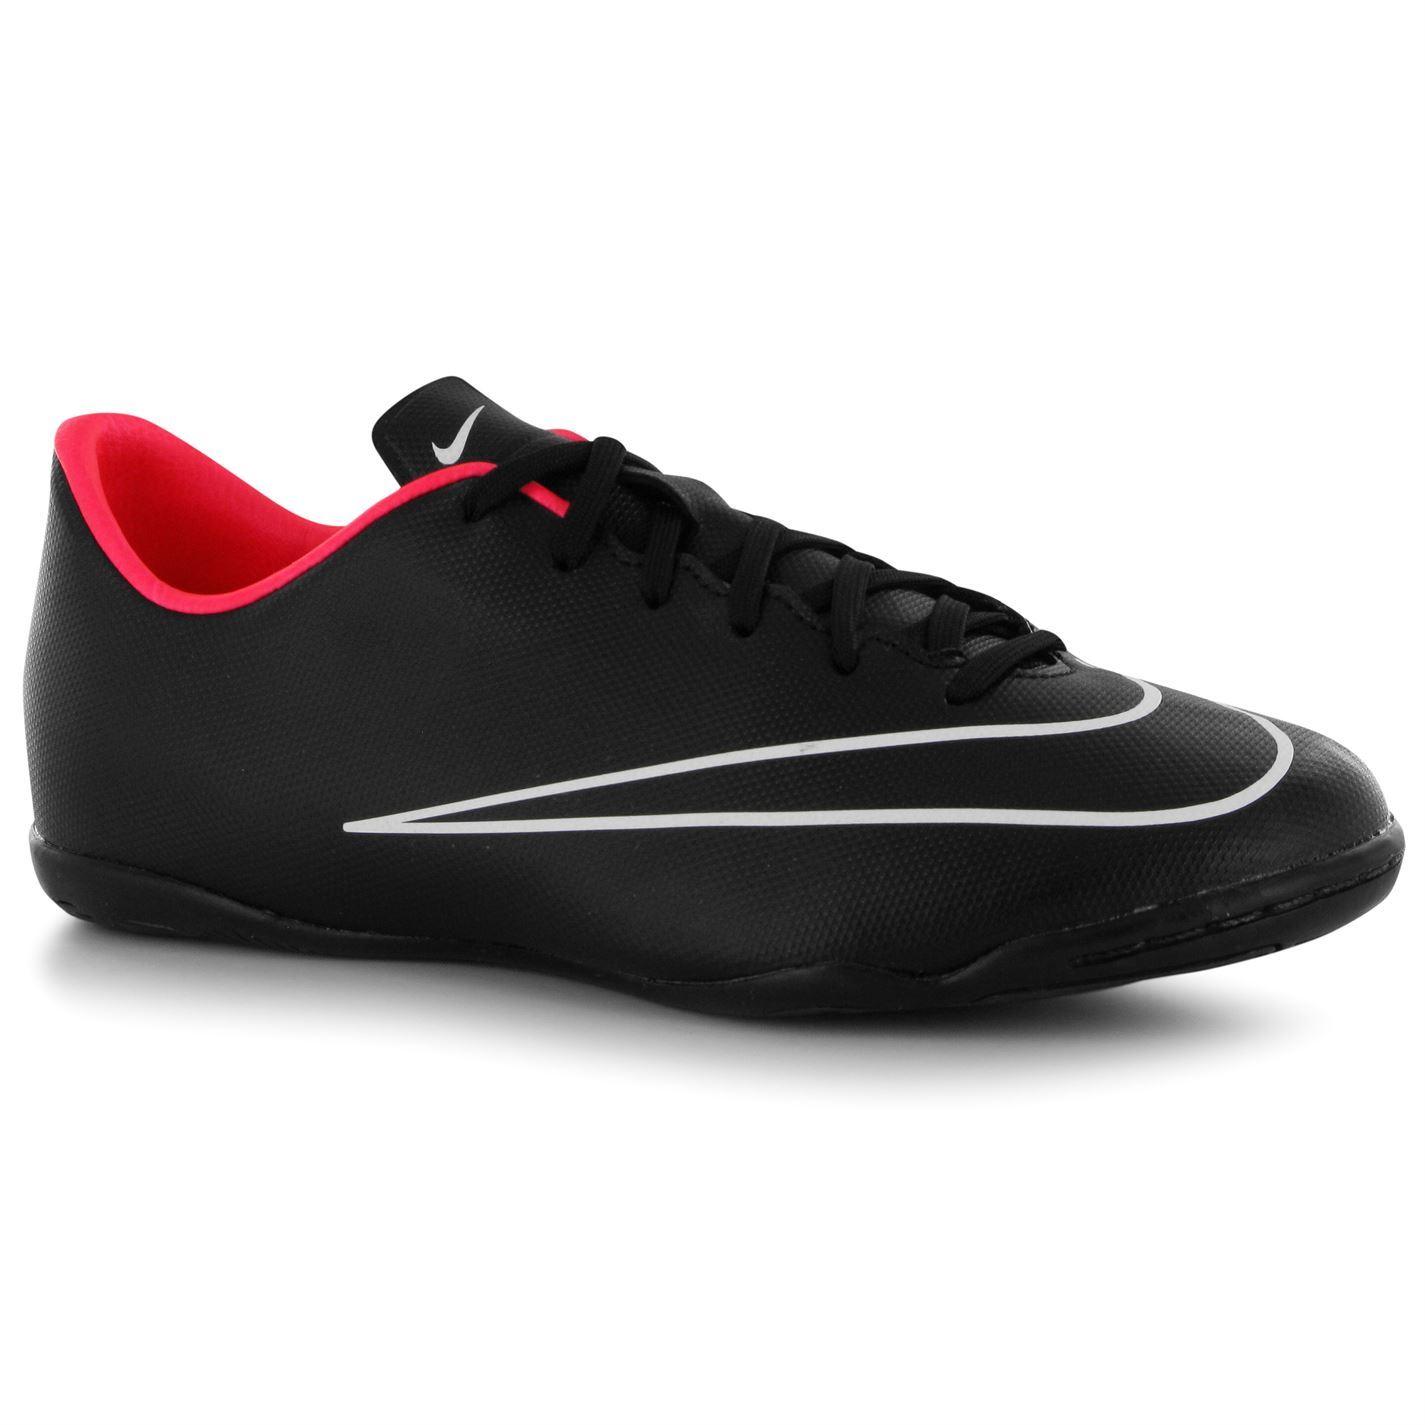 Junior Indoor Soccer Shoes Australia